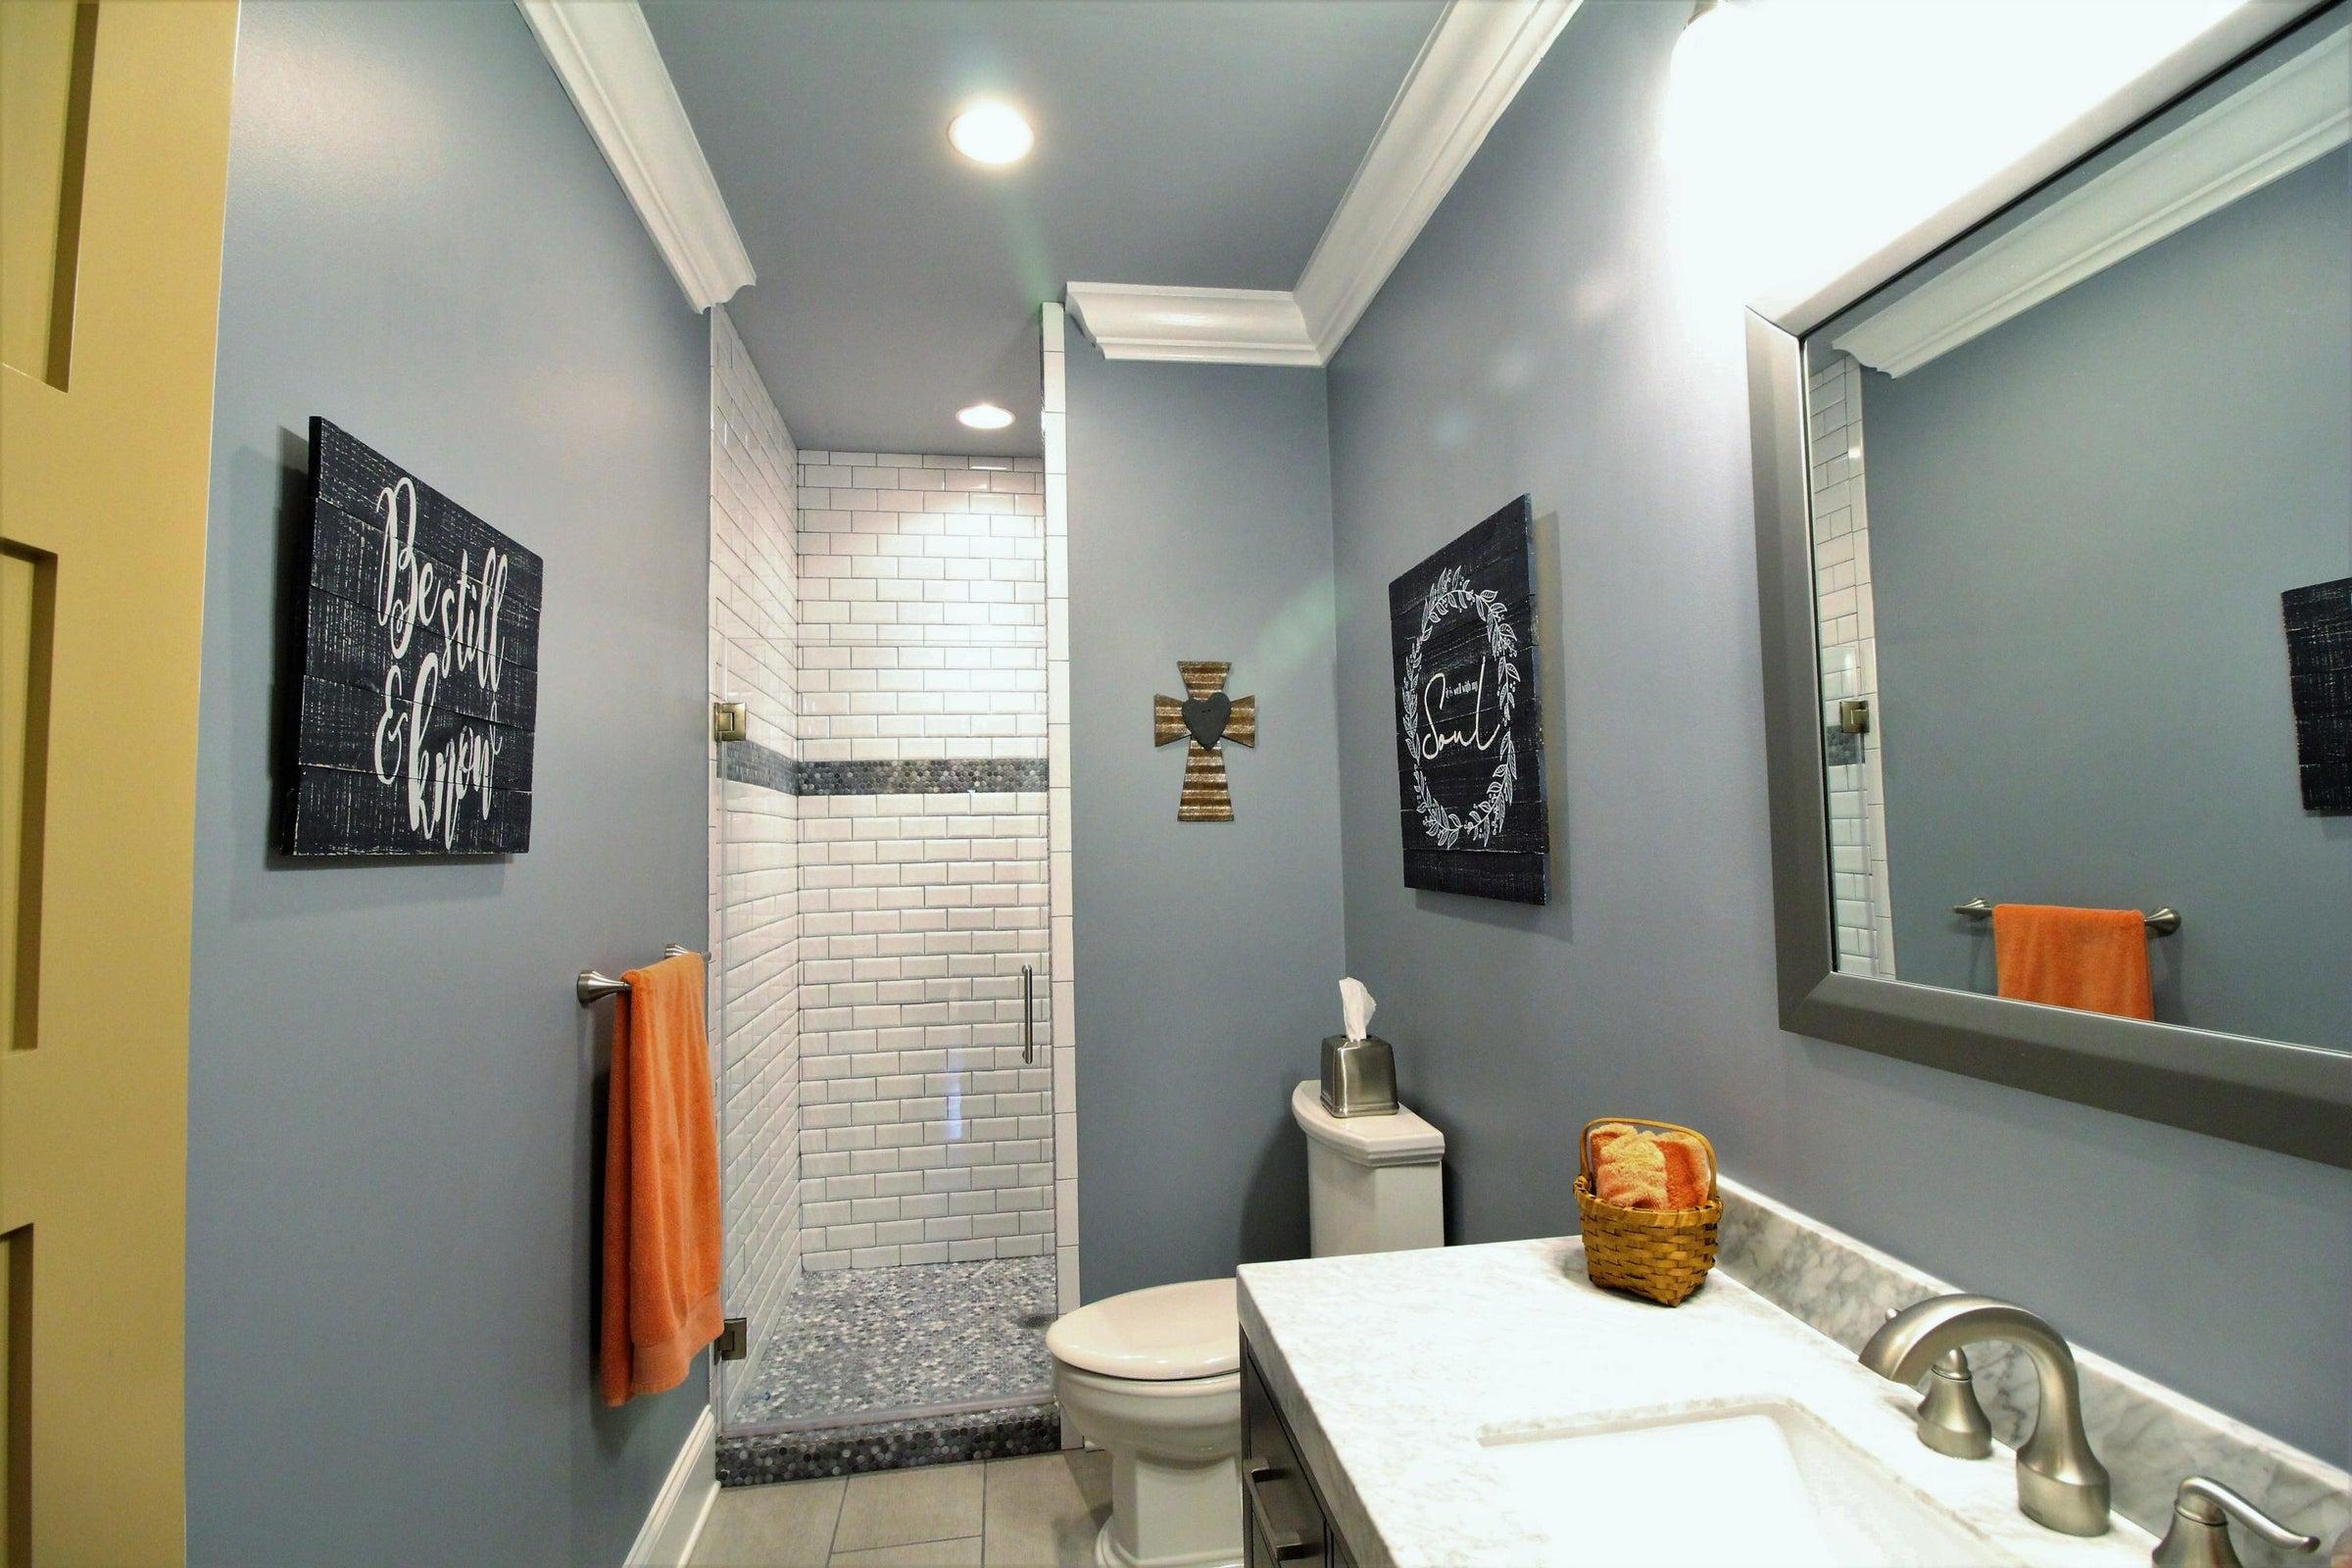 3rd Full Bathroom with walk-in shower